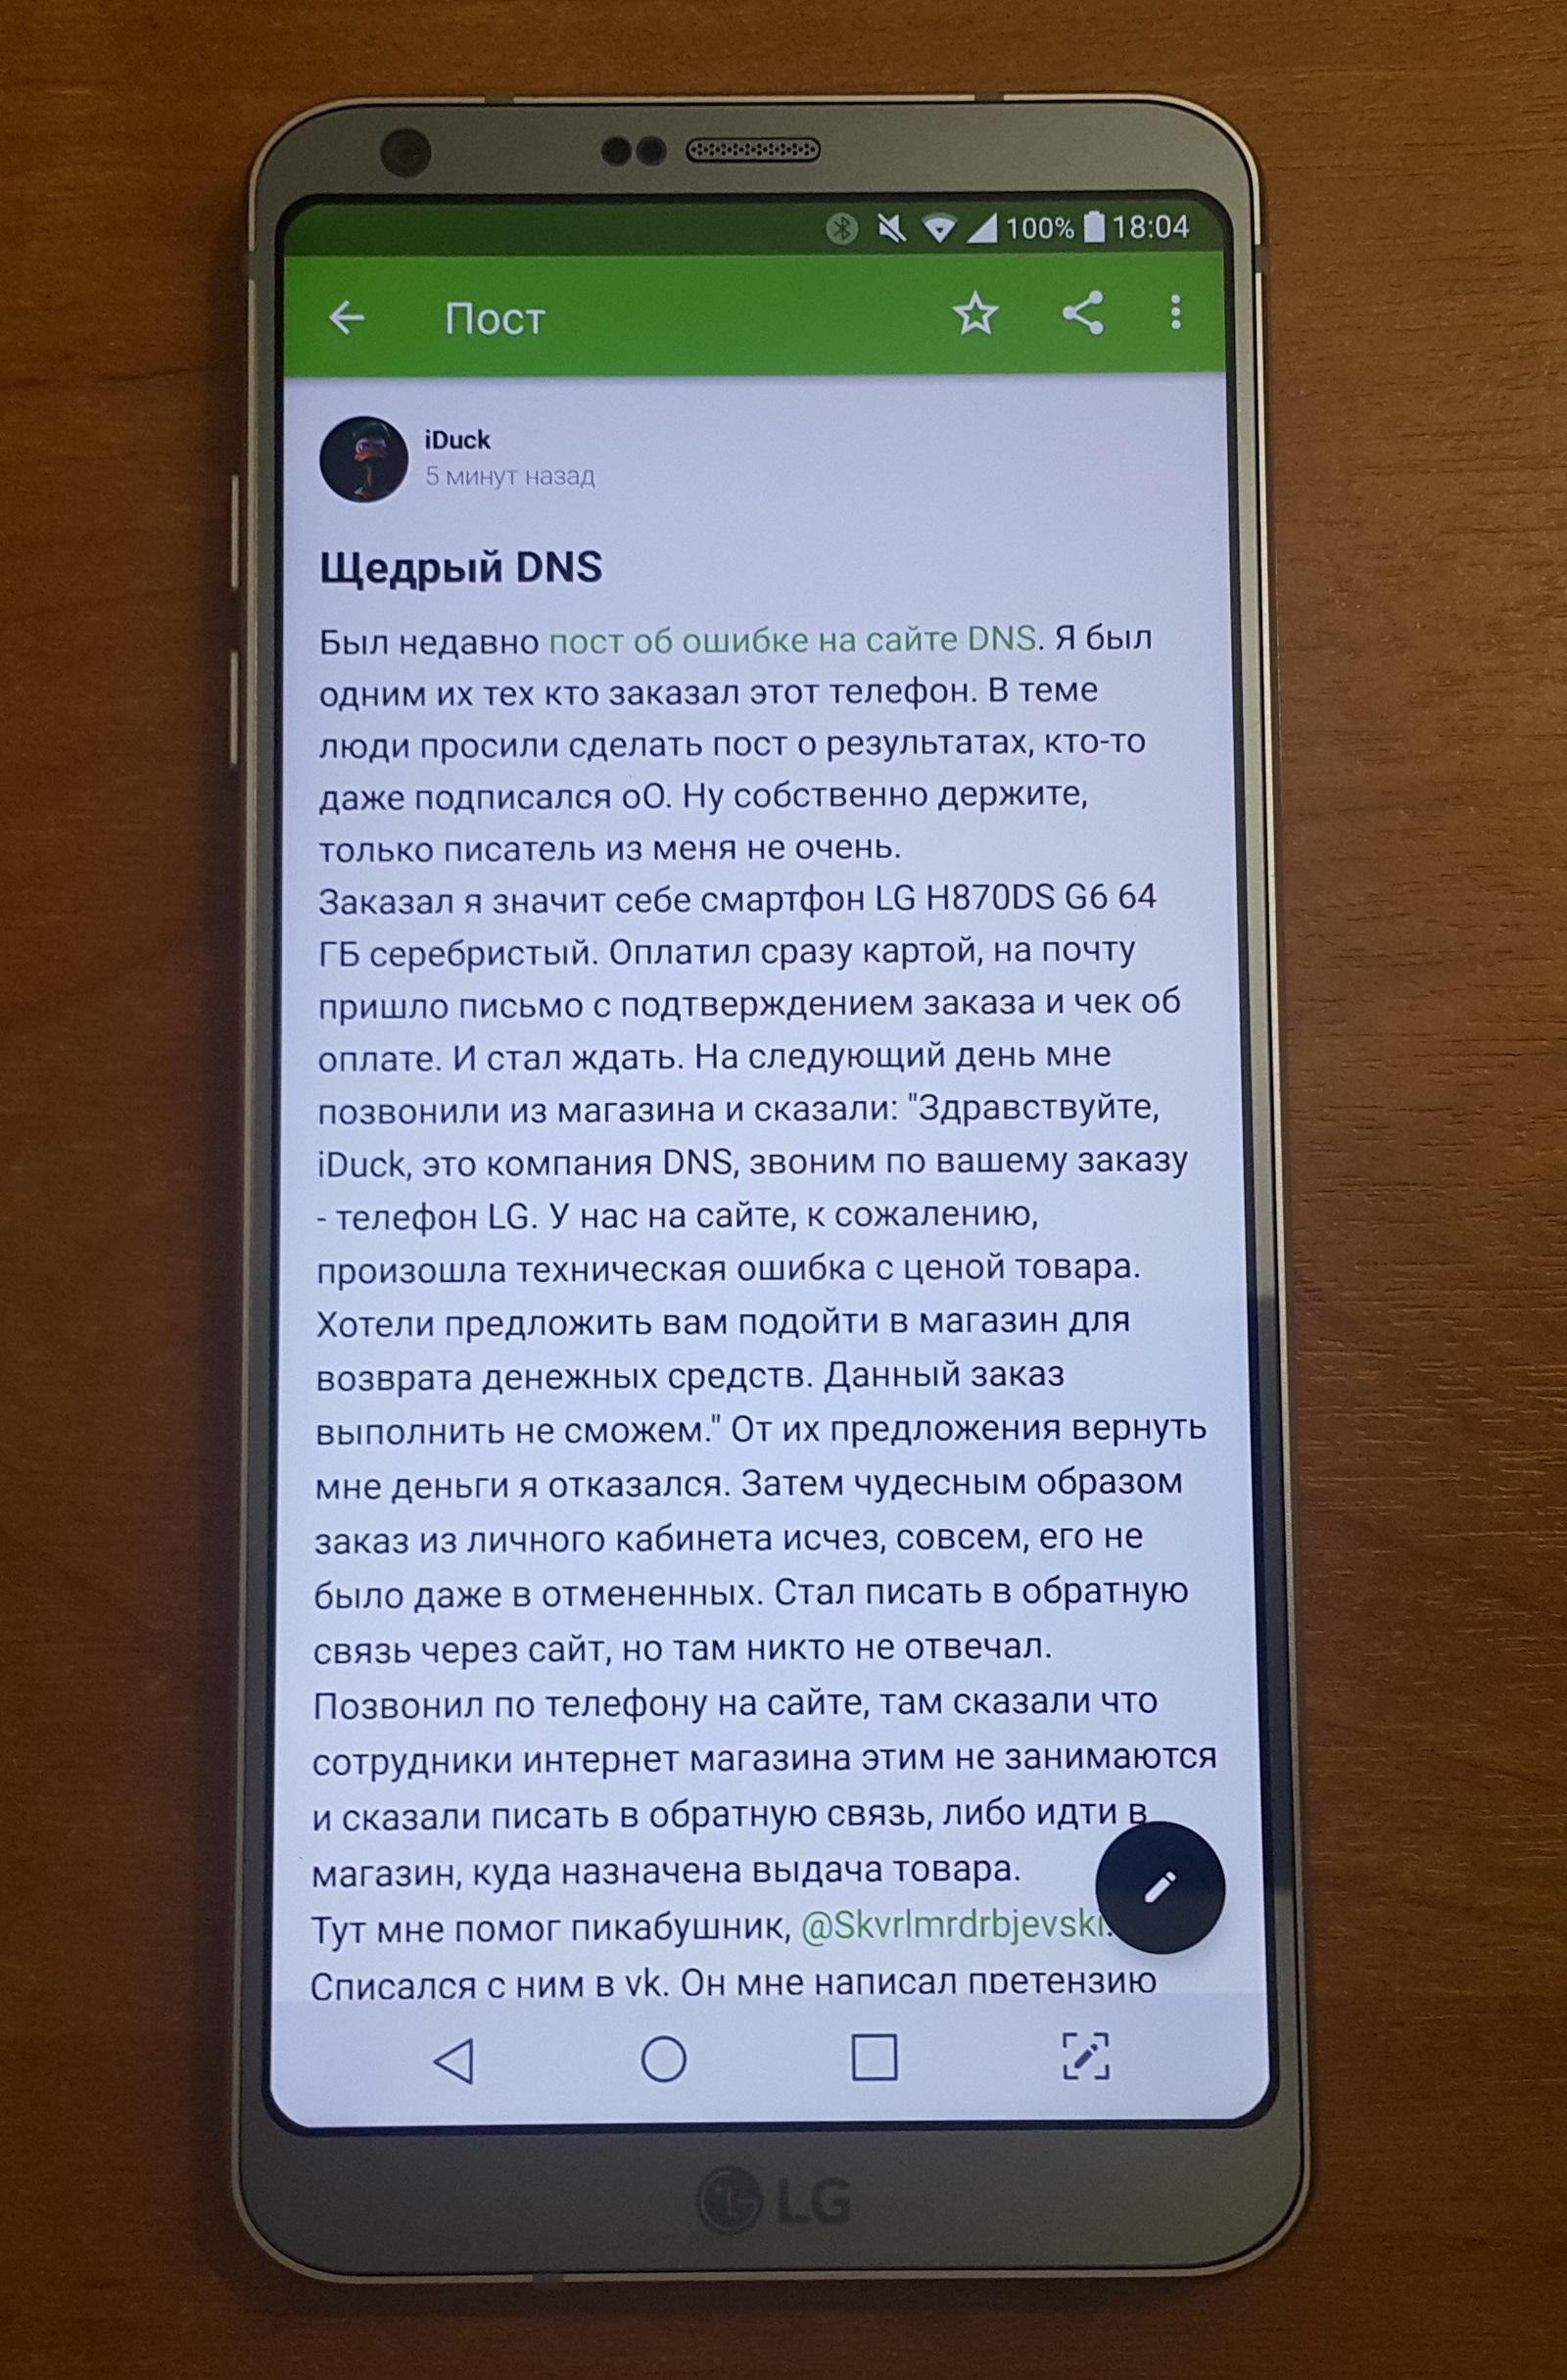 8b69d4619b2a Щедрый DNS DNS, Ошибка, Халява, Покупка, Длиннопост